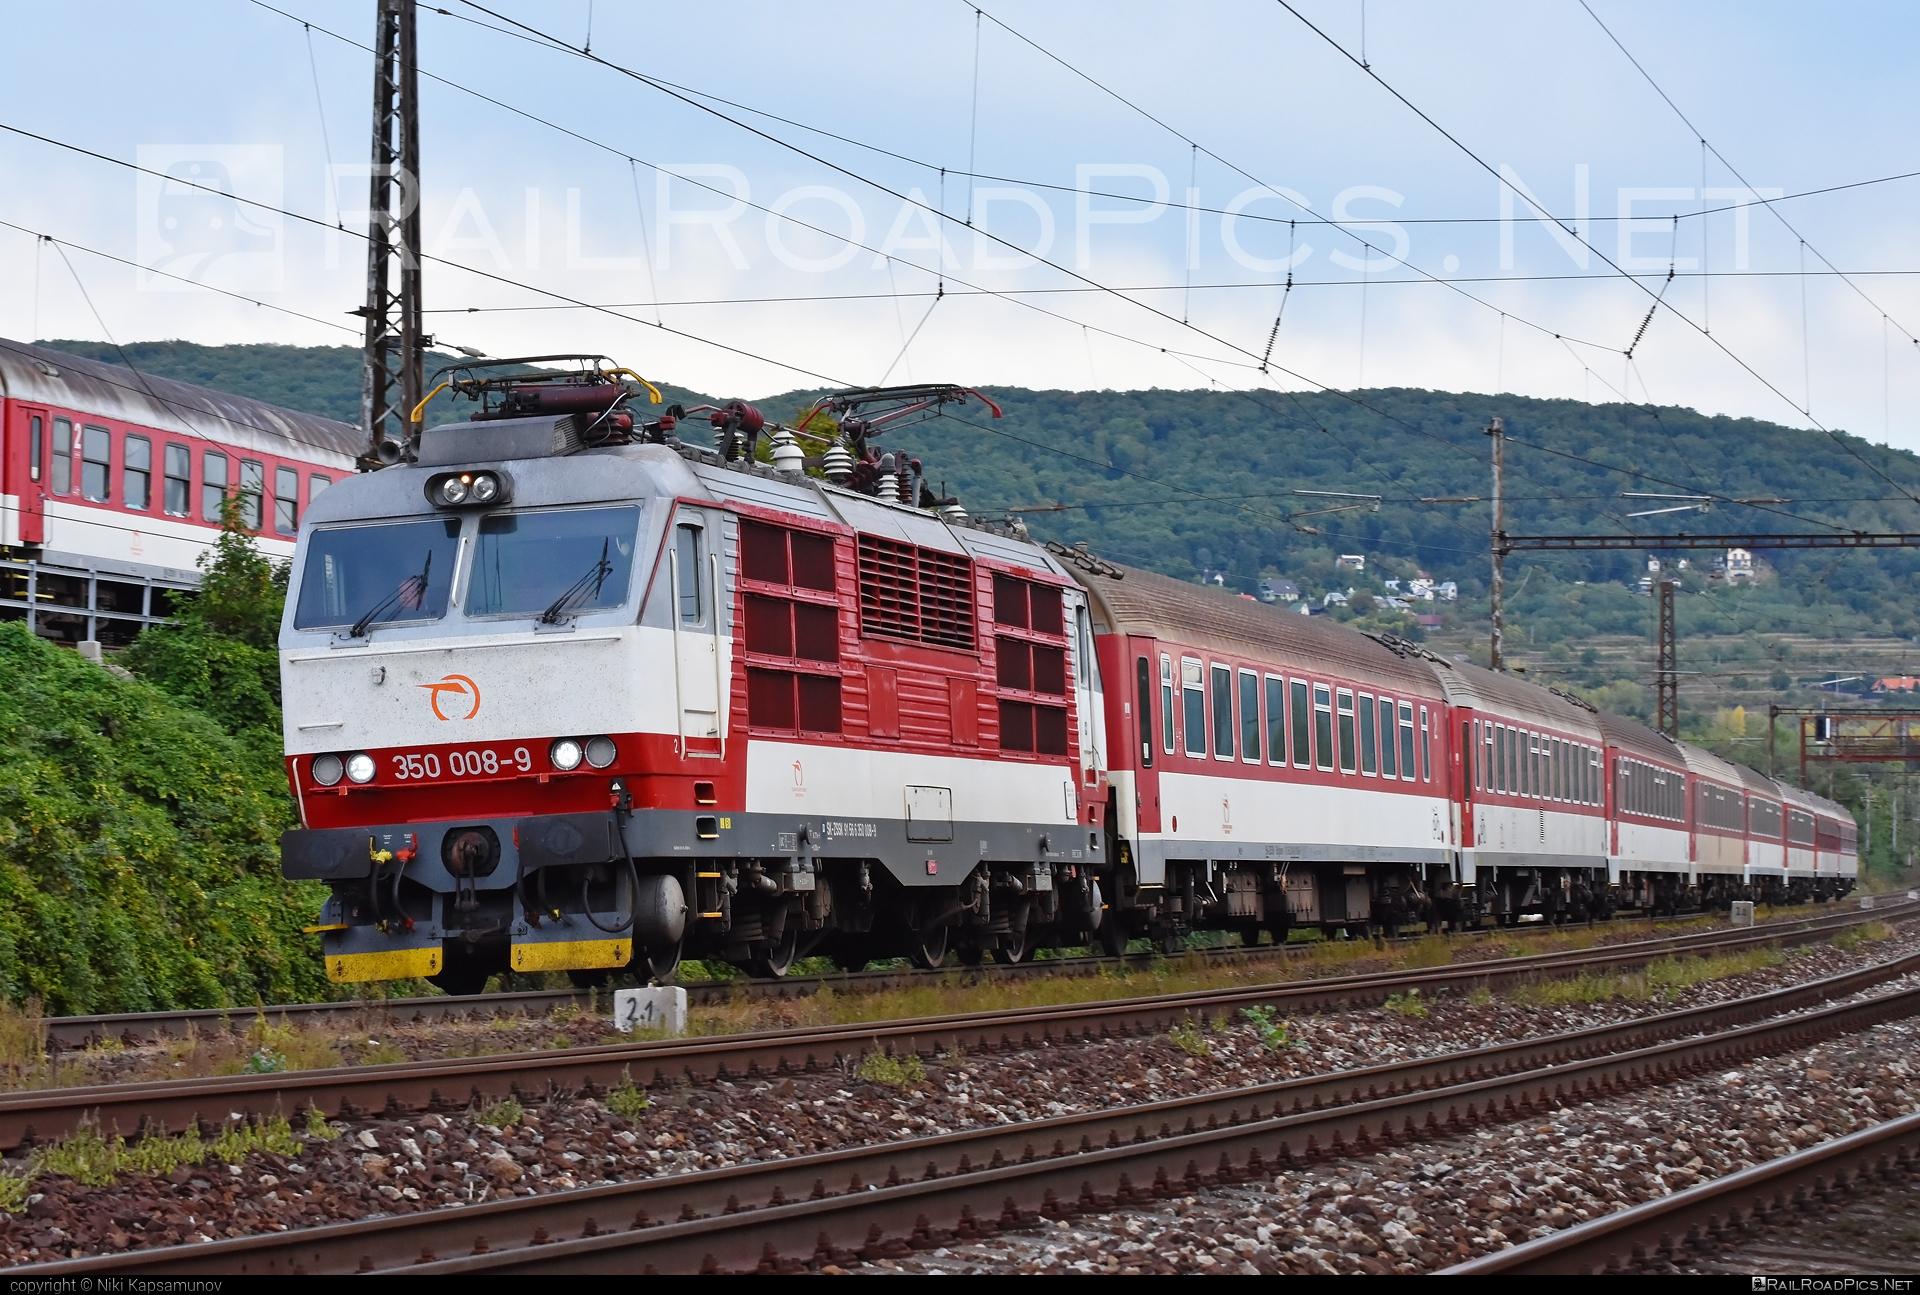 Škoda 55E - 350 008-9 operated by Železničná Spoločnost' Slovensko, a.s. #ZeleznicnaSpolocnostSlovensko #gorila #locomotive350 #skoda #skoda55e #zssk